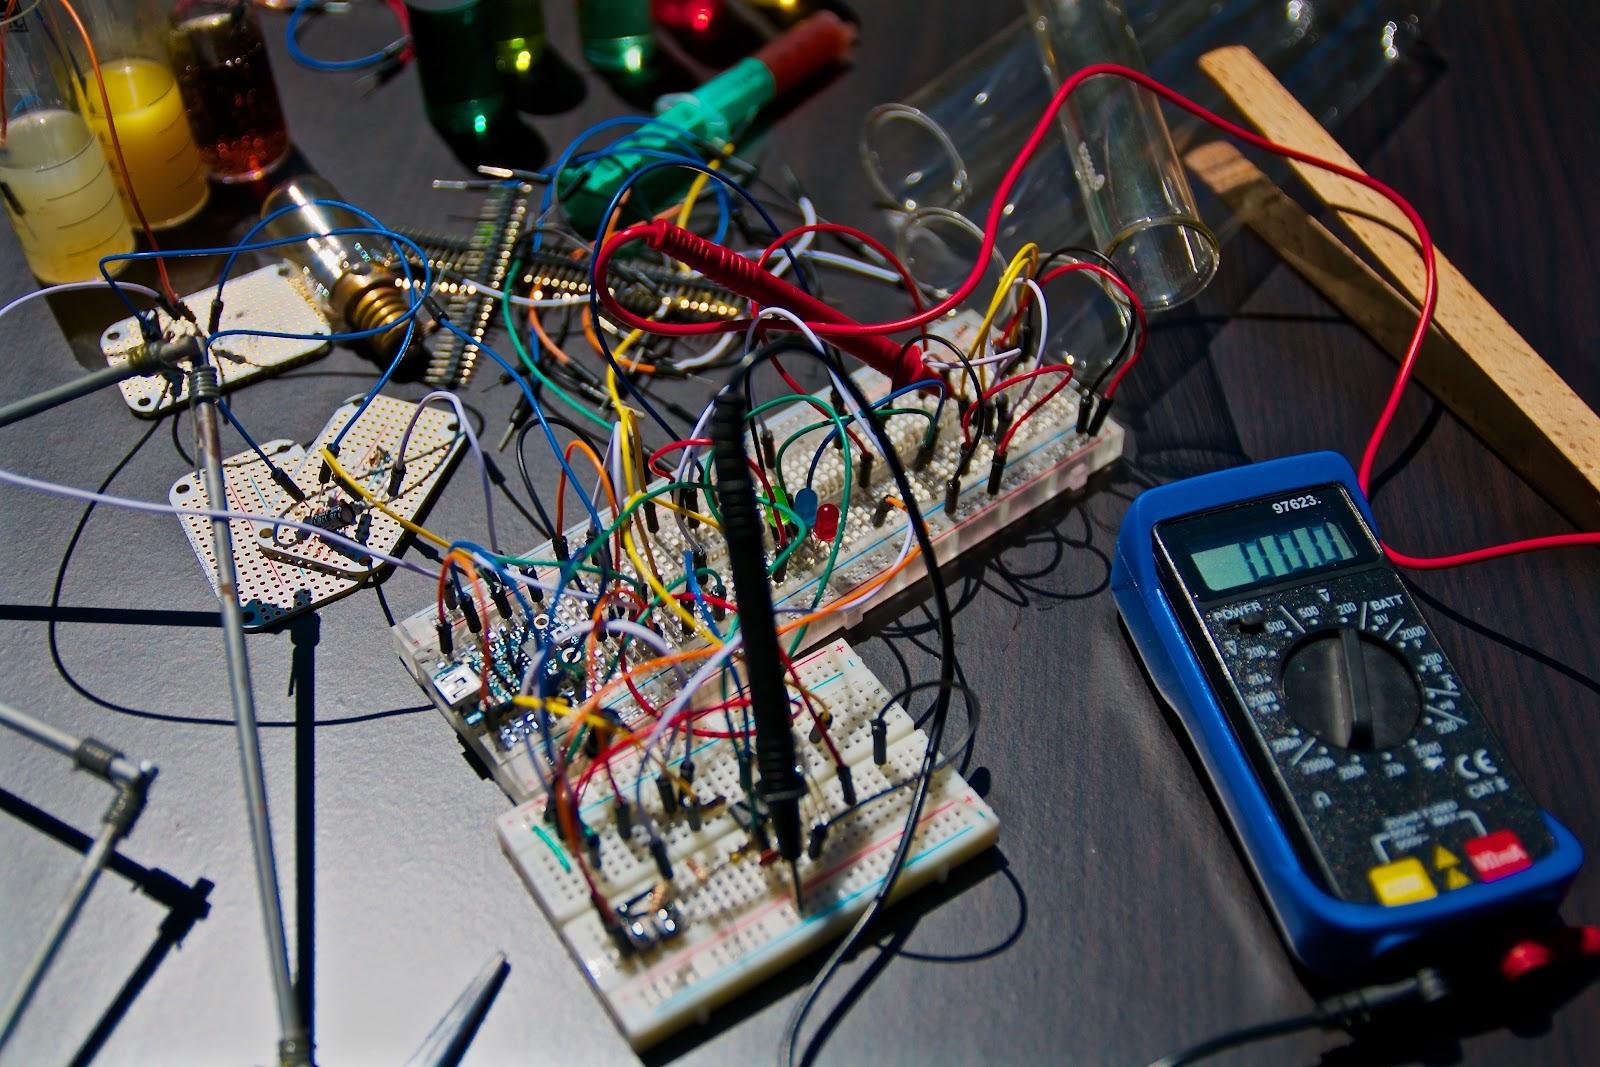 Electrical estimator